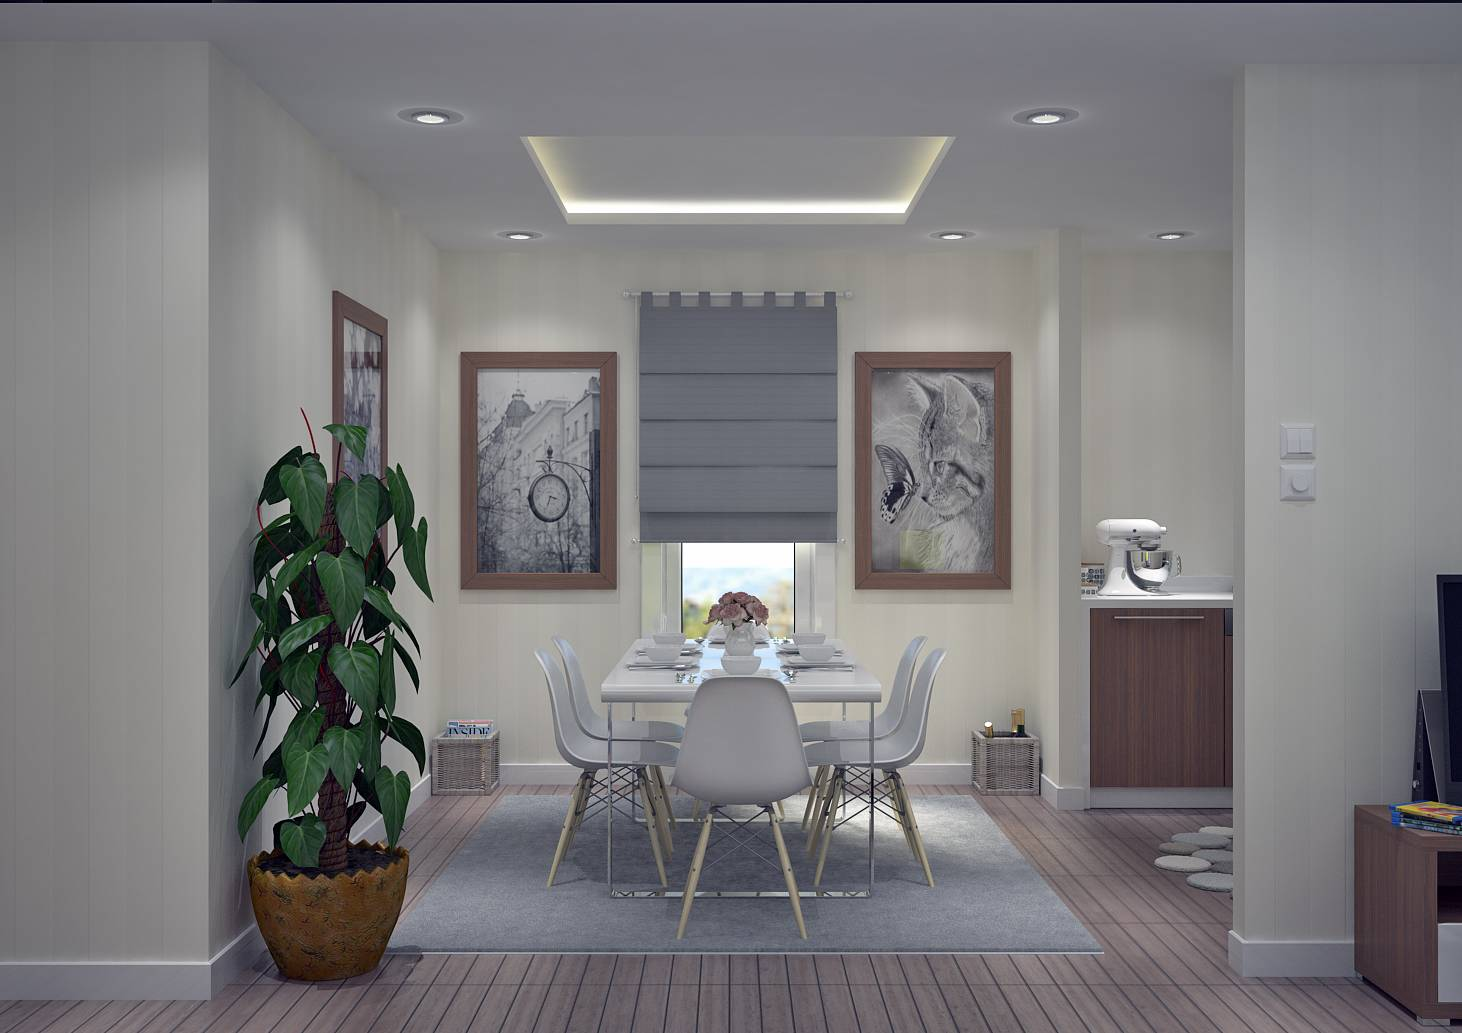 Maison moderne 80m2 mc immo for Maison moderne 80m2